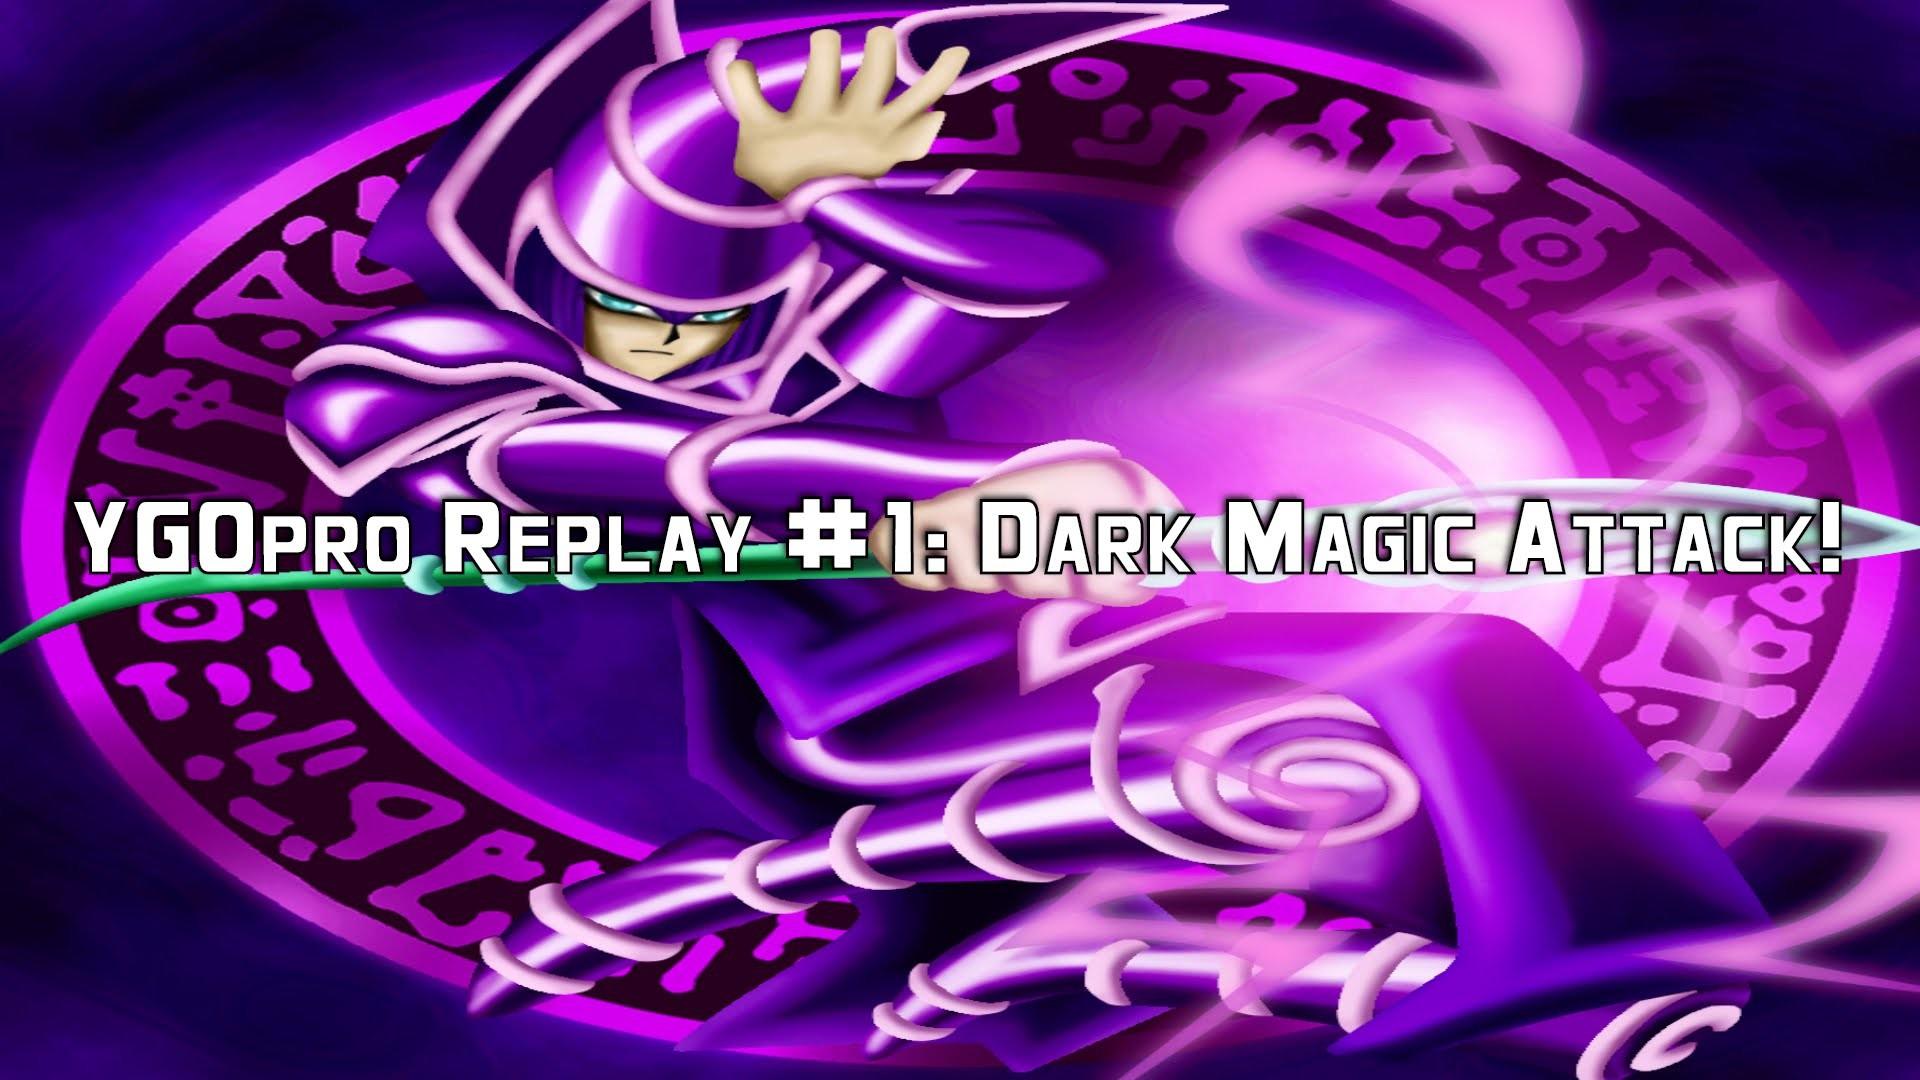 Yu-Gi-Oh! YGOpro Replay #1: Dark Magic Attack! (Dark Magician Deck 2016) –  YouTube